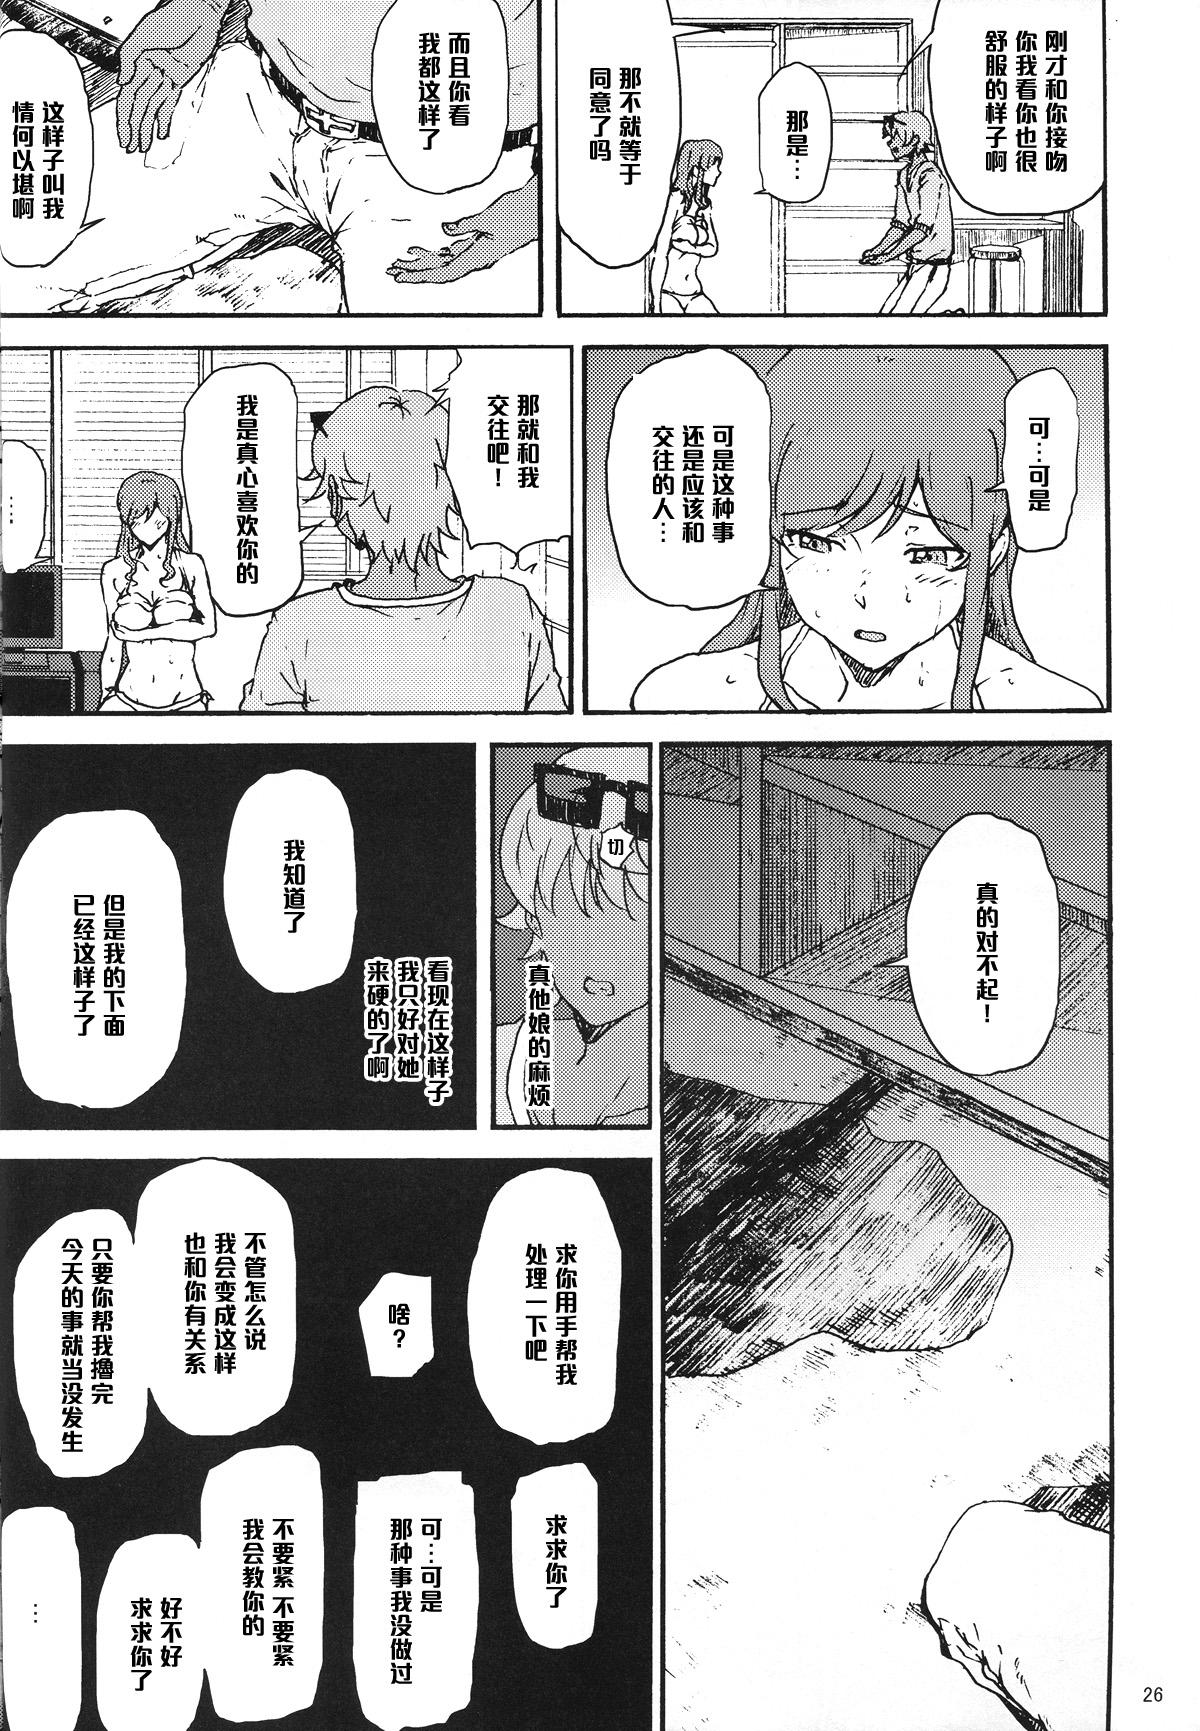 Mirai-chan ga Sandaime SGOCK no Leader ni Damasare Yarechau Hon 25